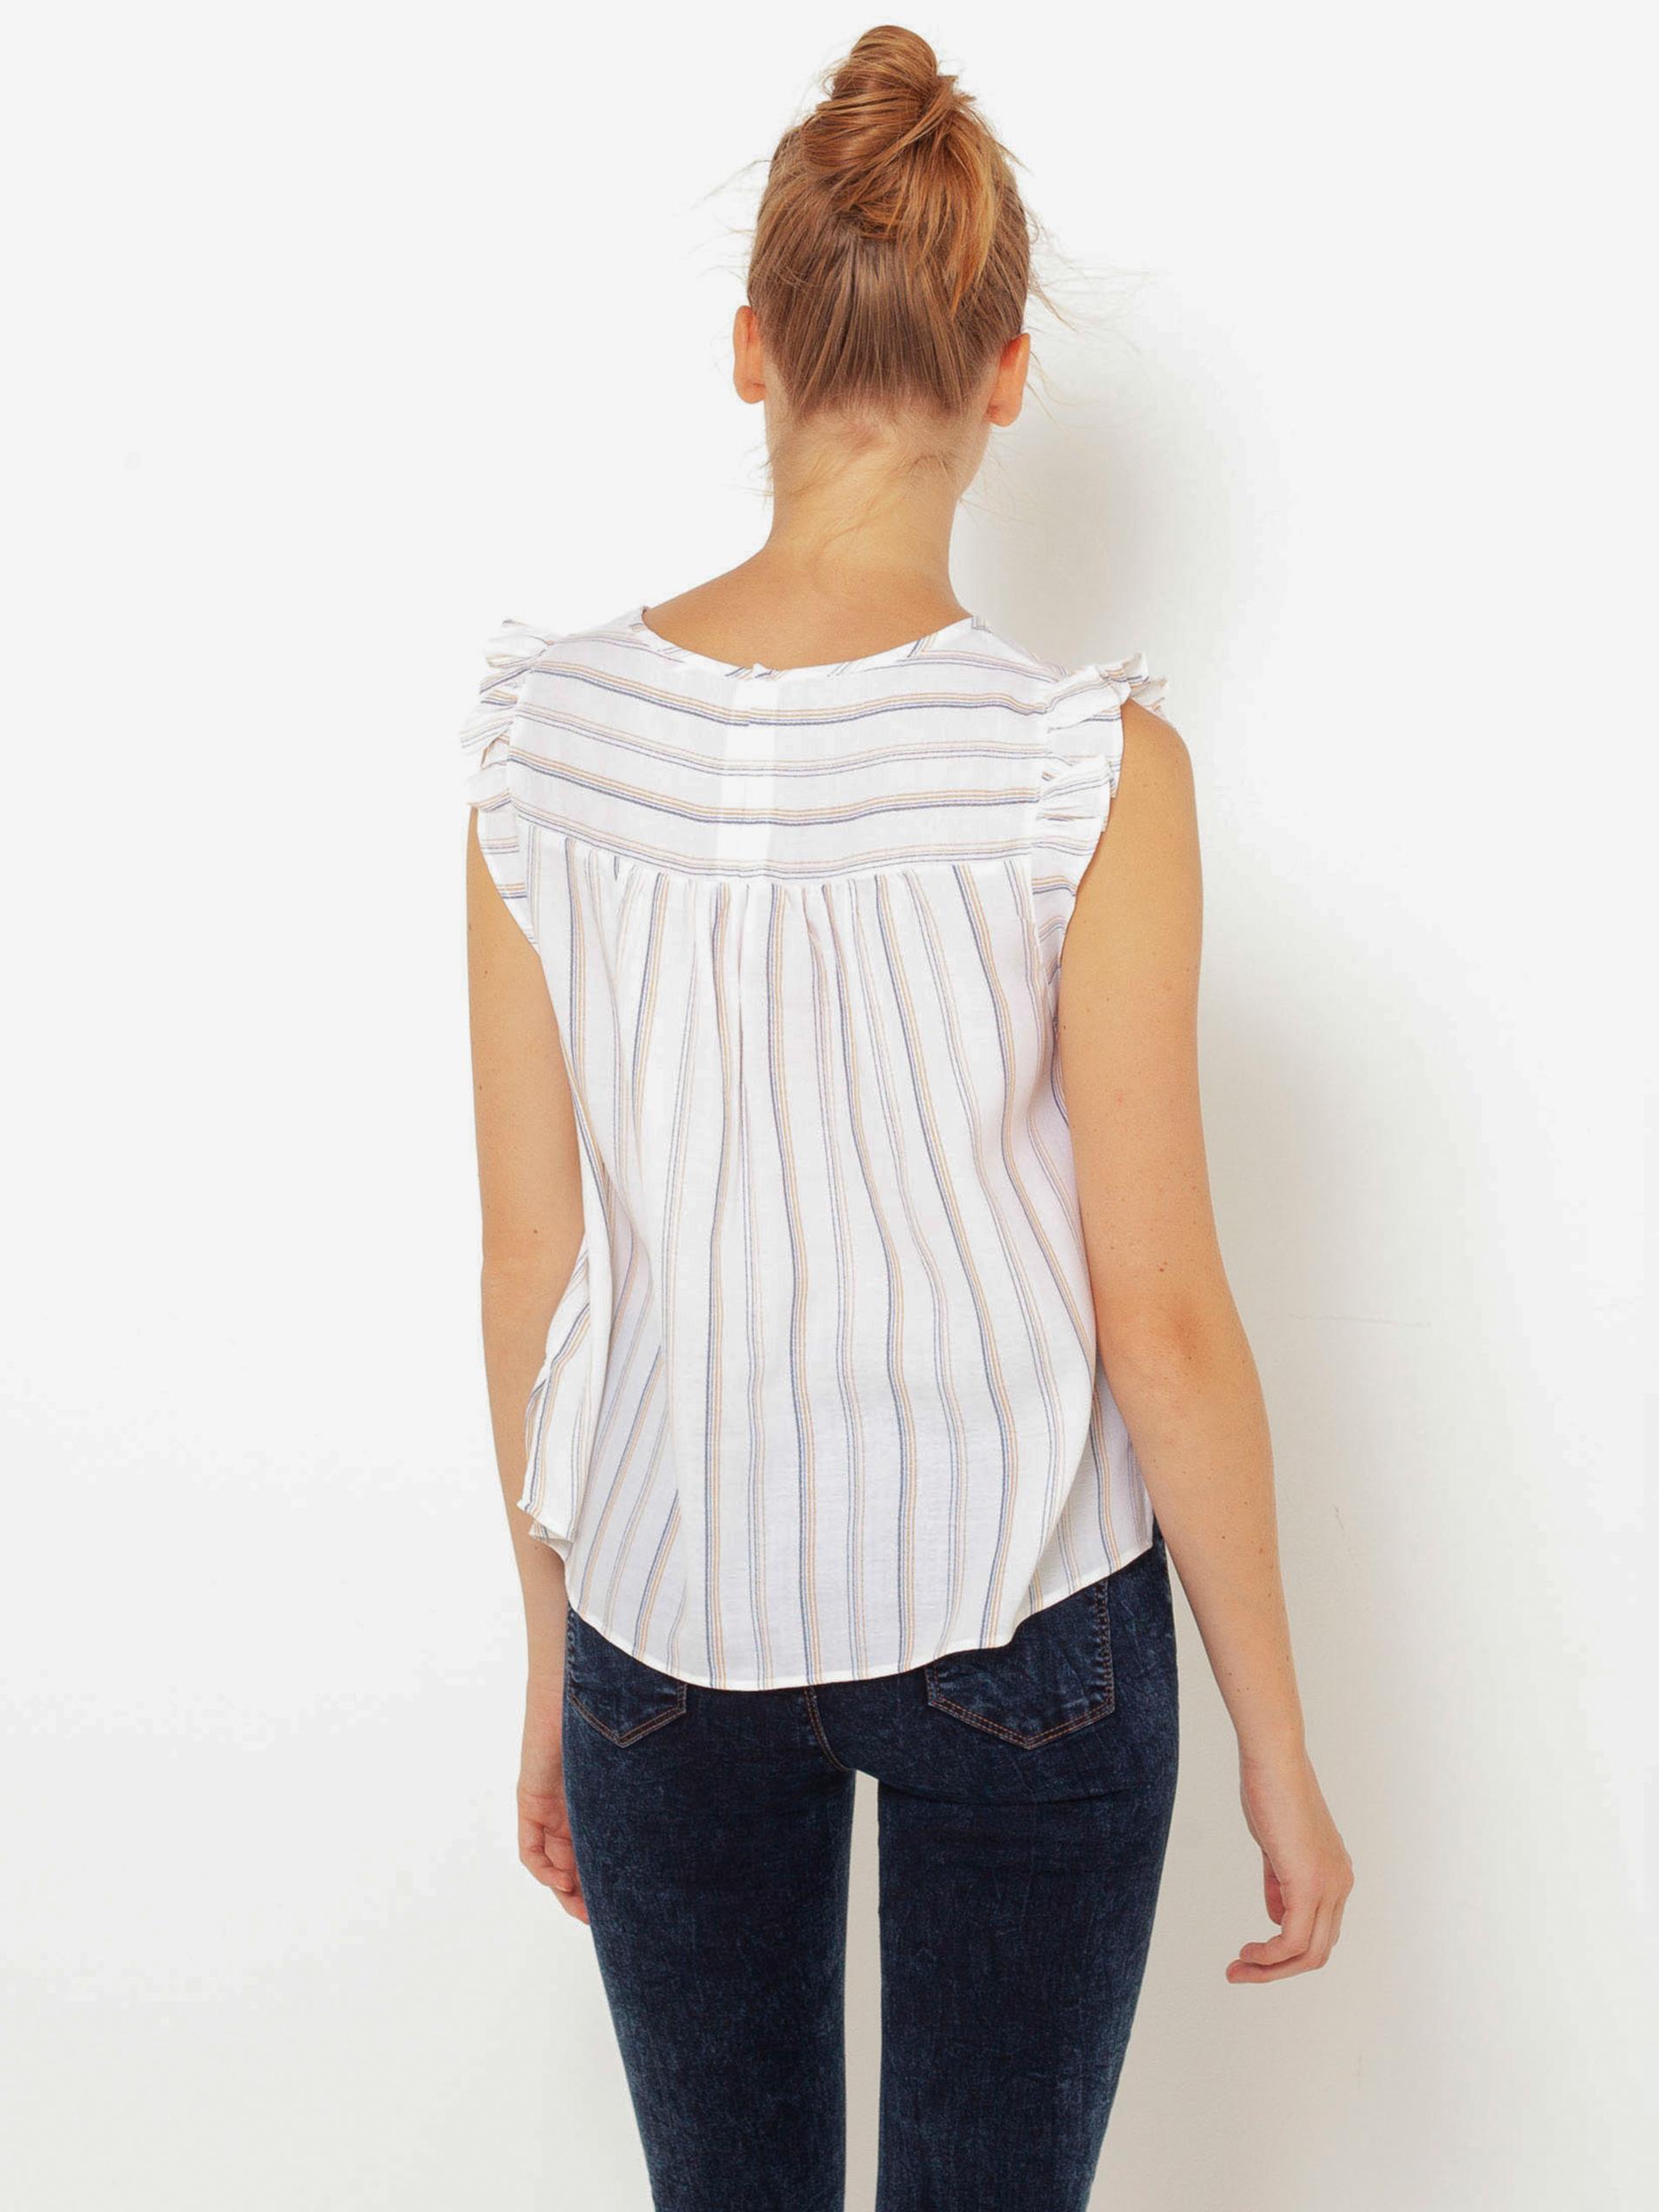 CAMAIEU white striped blouse